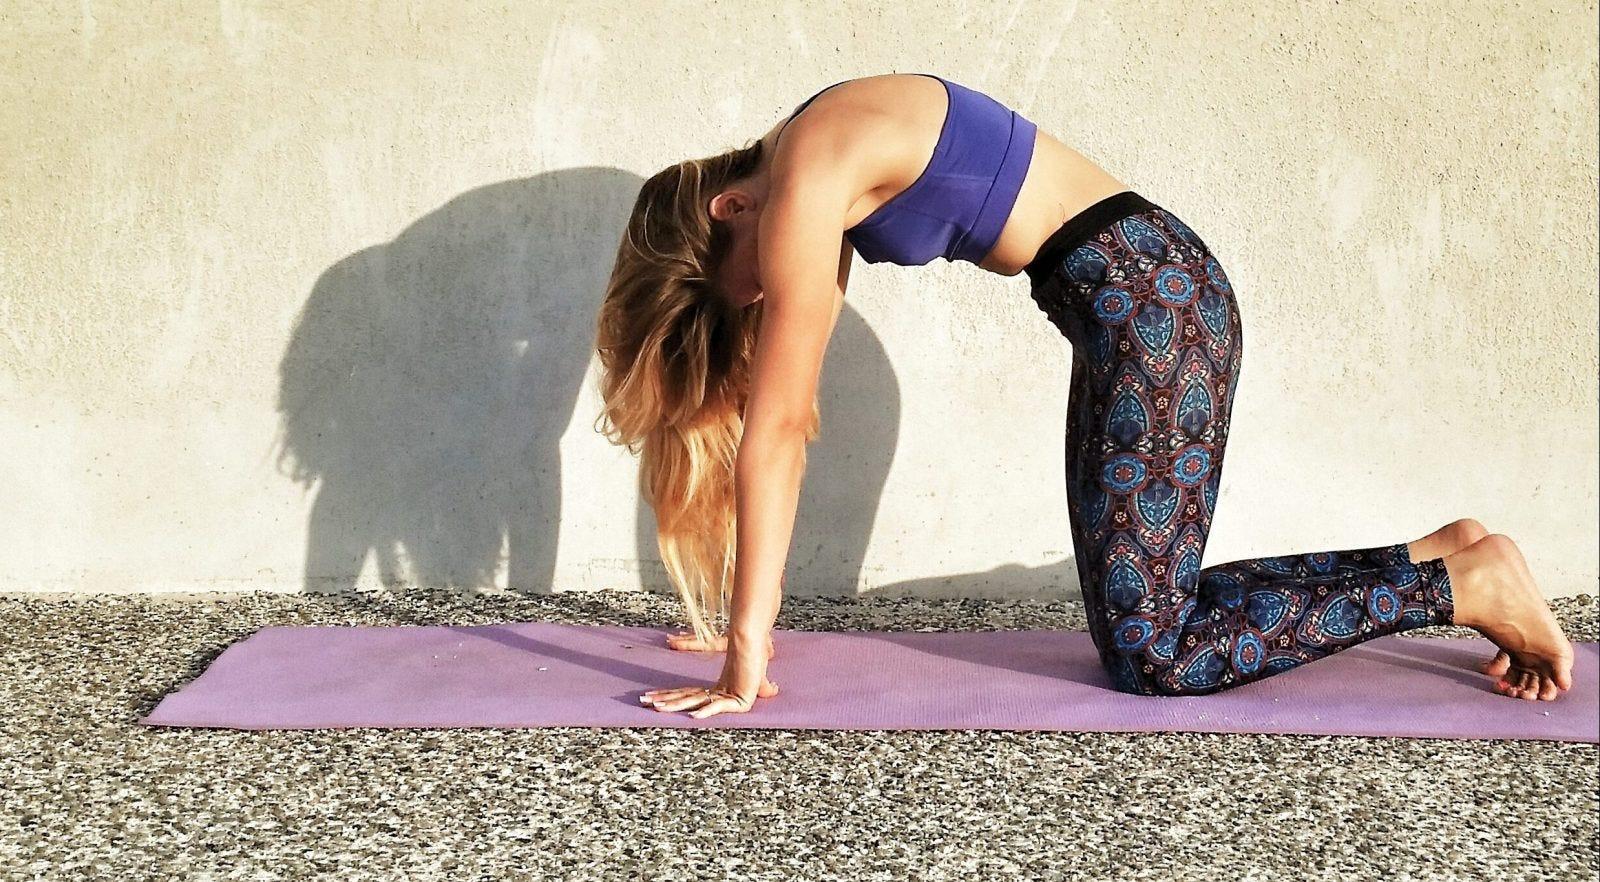 Woman doing cat pose in yoga